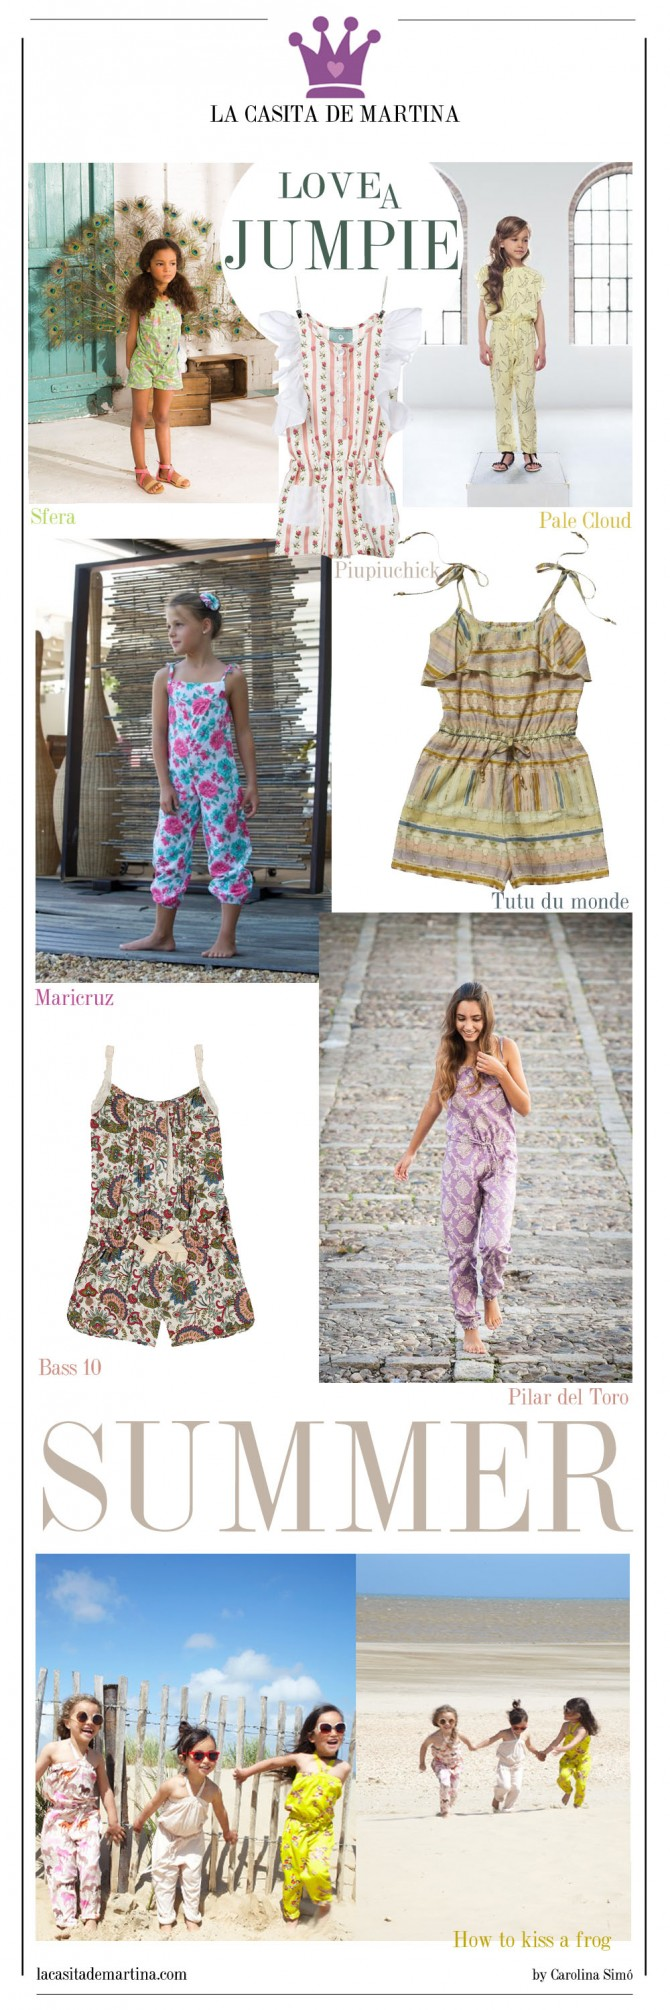 Tendencias Moda Infantil, Ropa Niños, Blog de Moda Infantil, La casita de Martina,  Carolina Simó